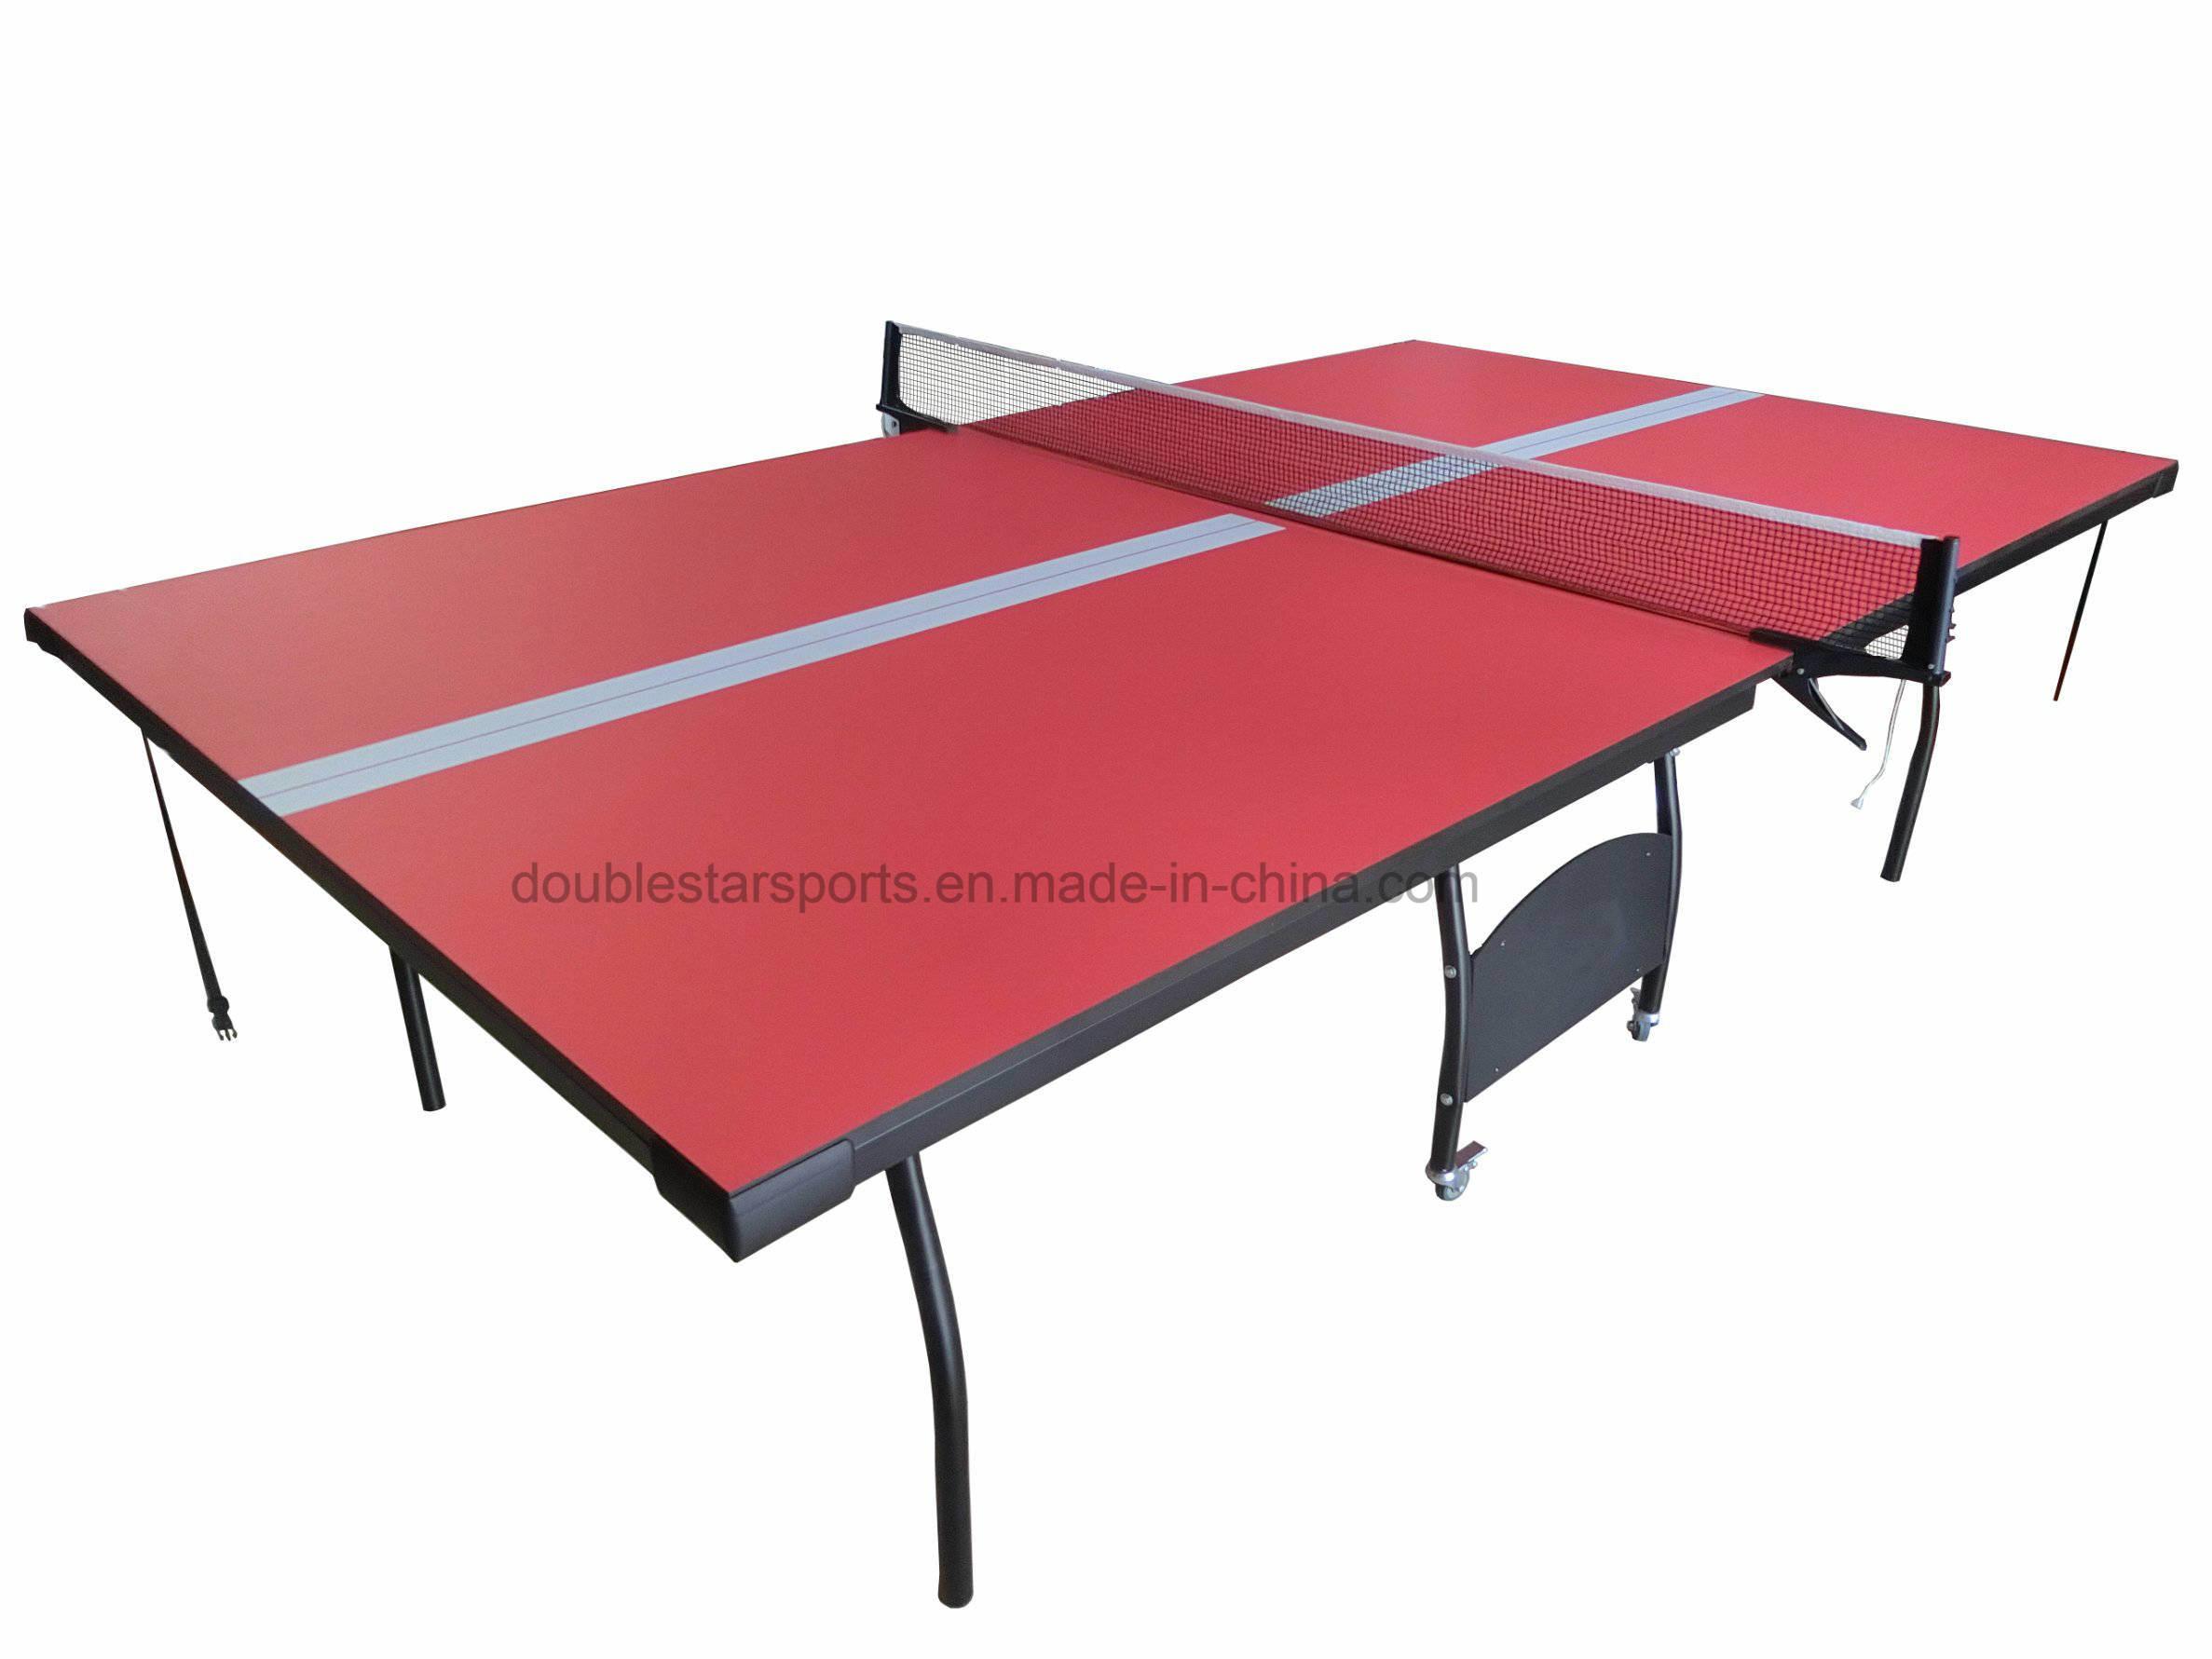 Cheap Double Folding Table Tennis Table